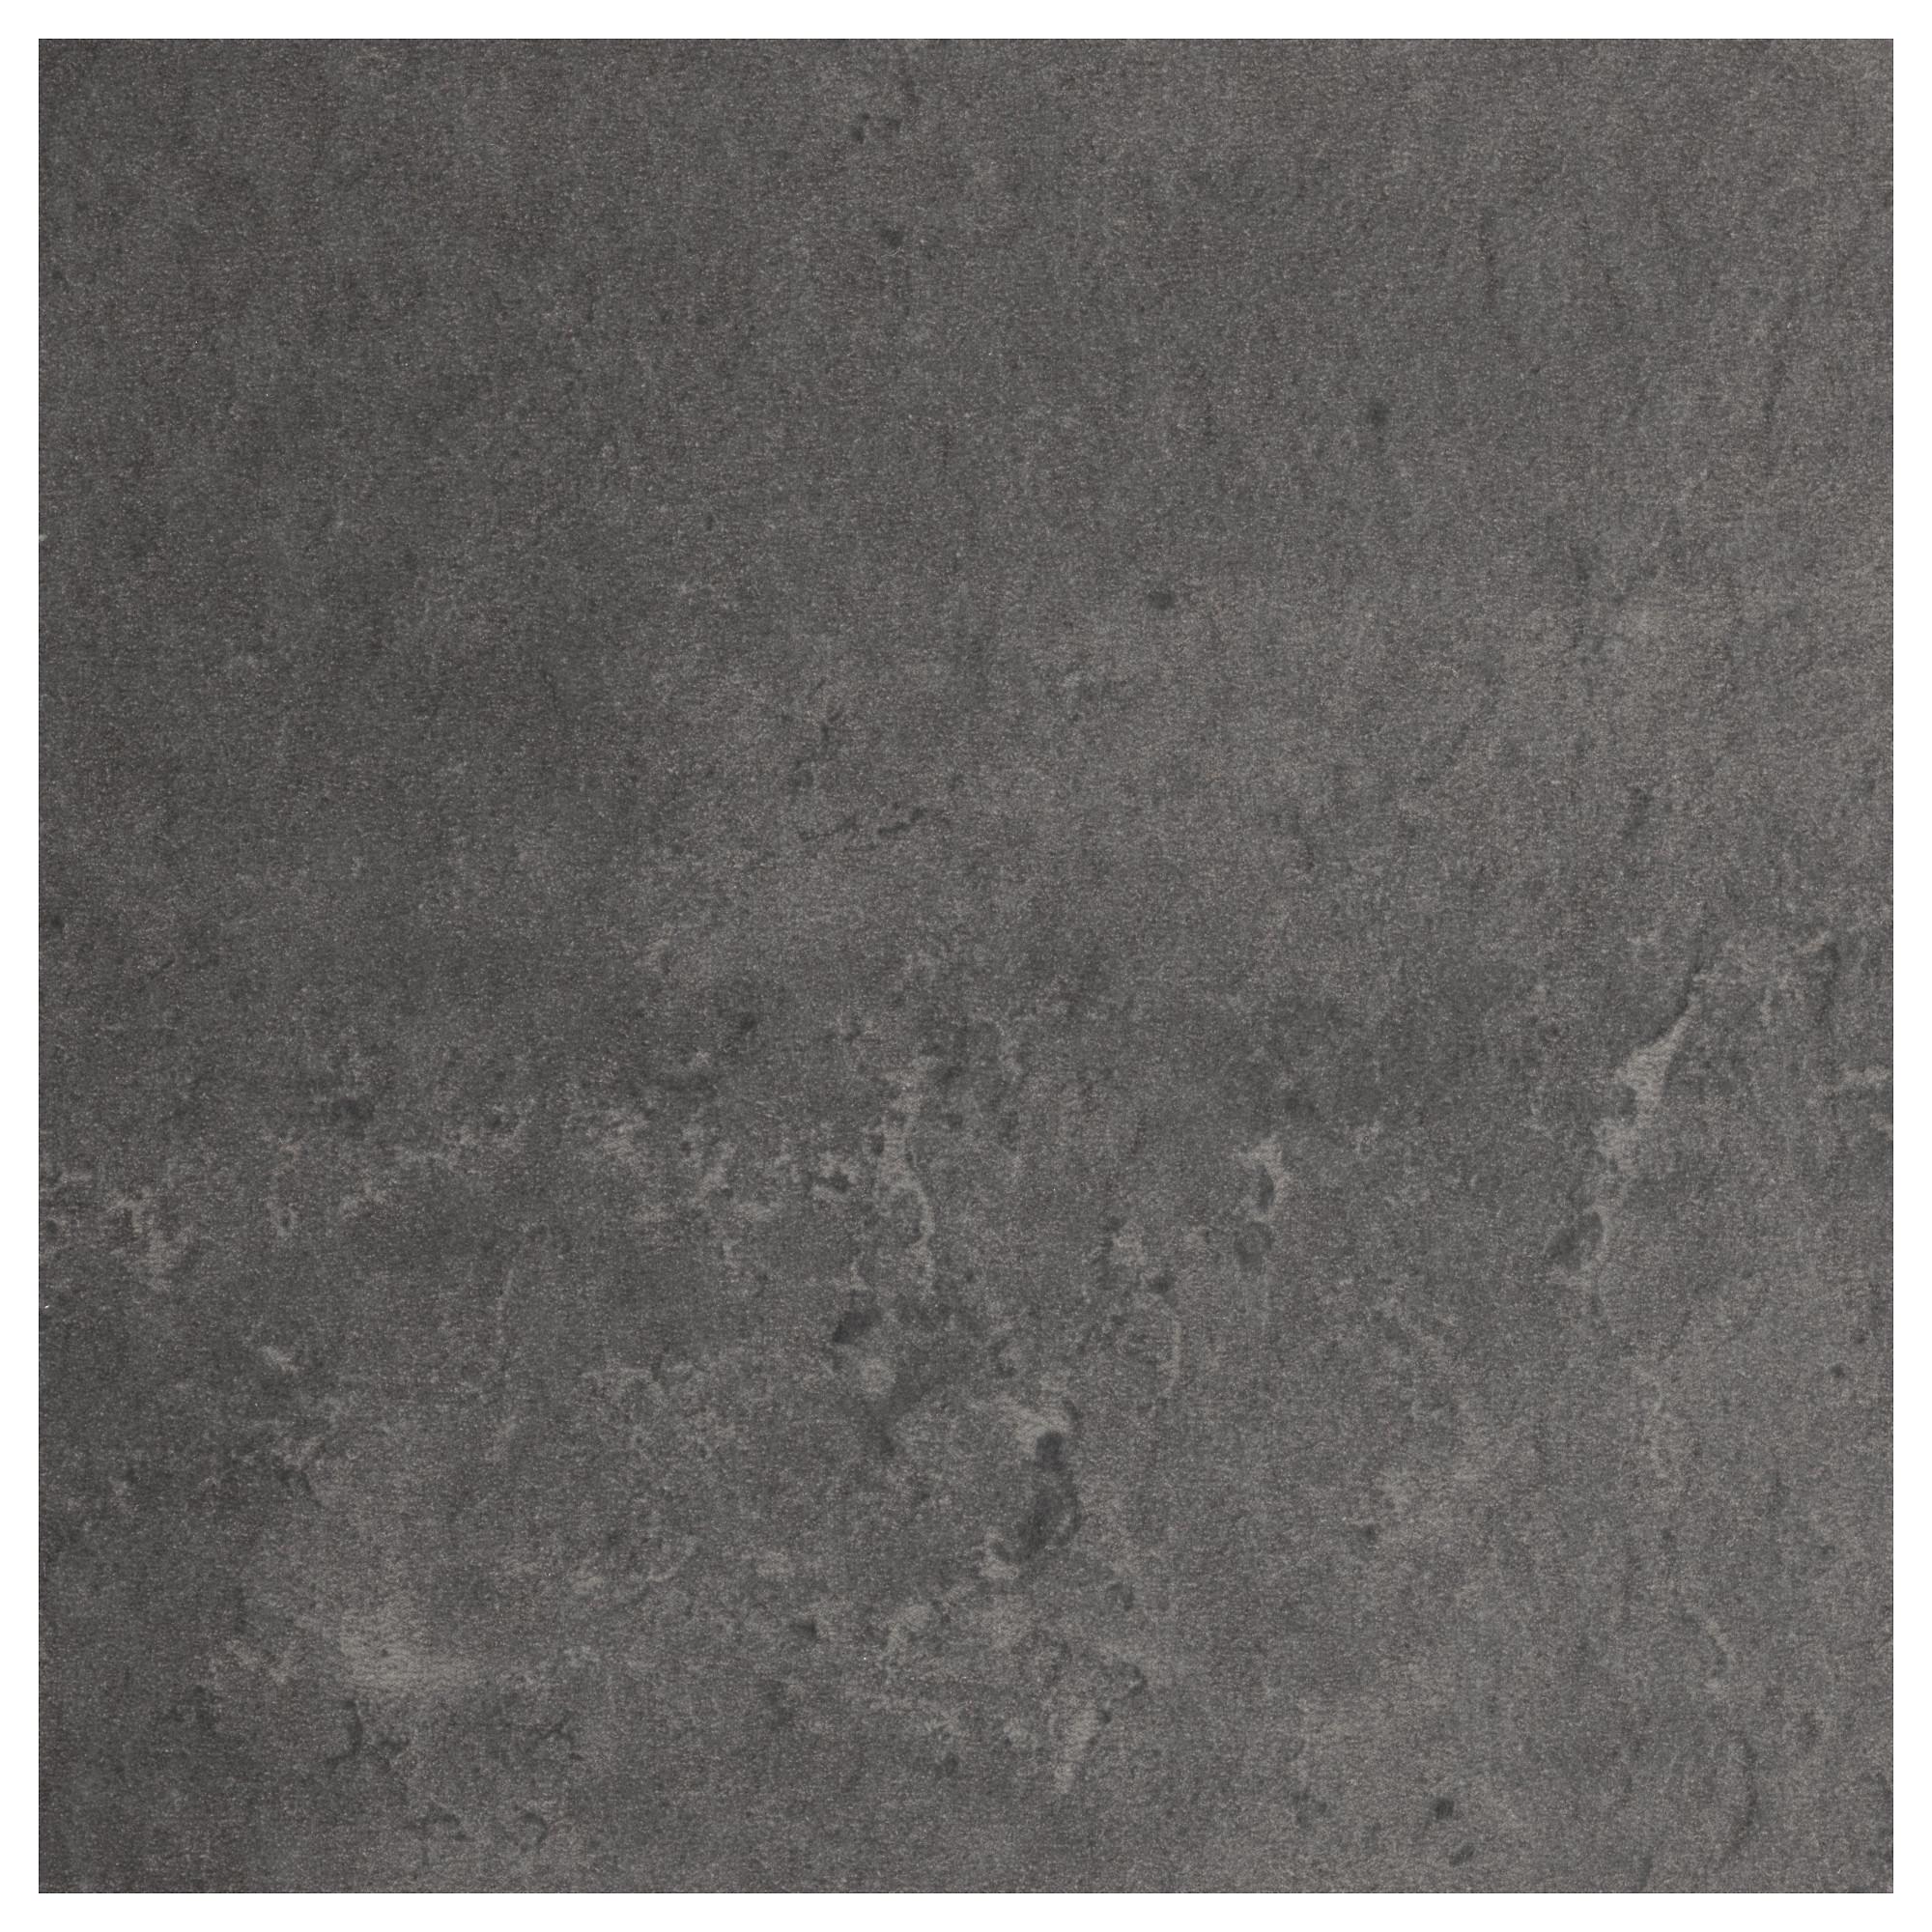 ikea ekbacken countertop concrete effect